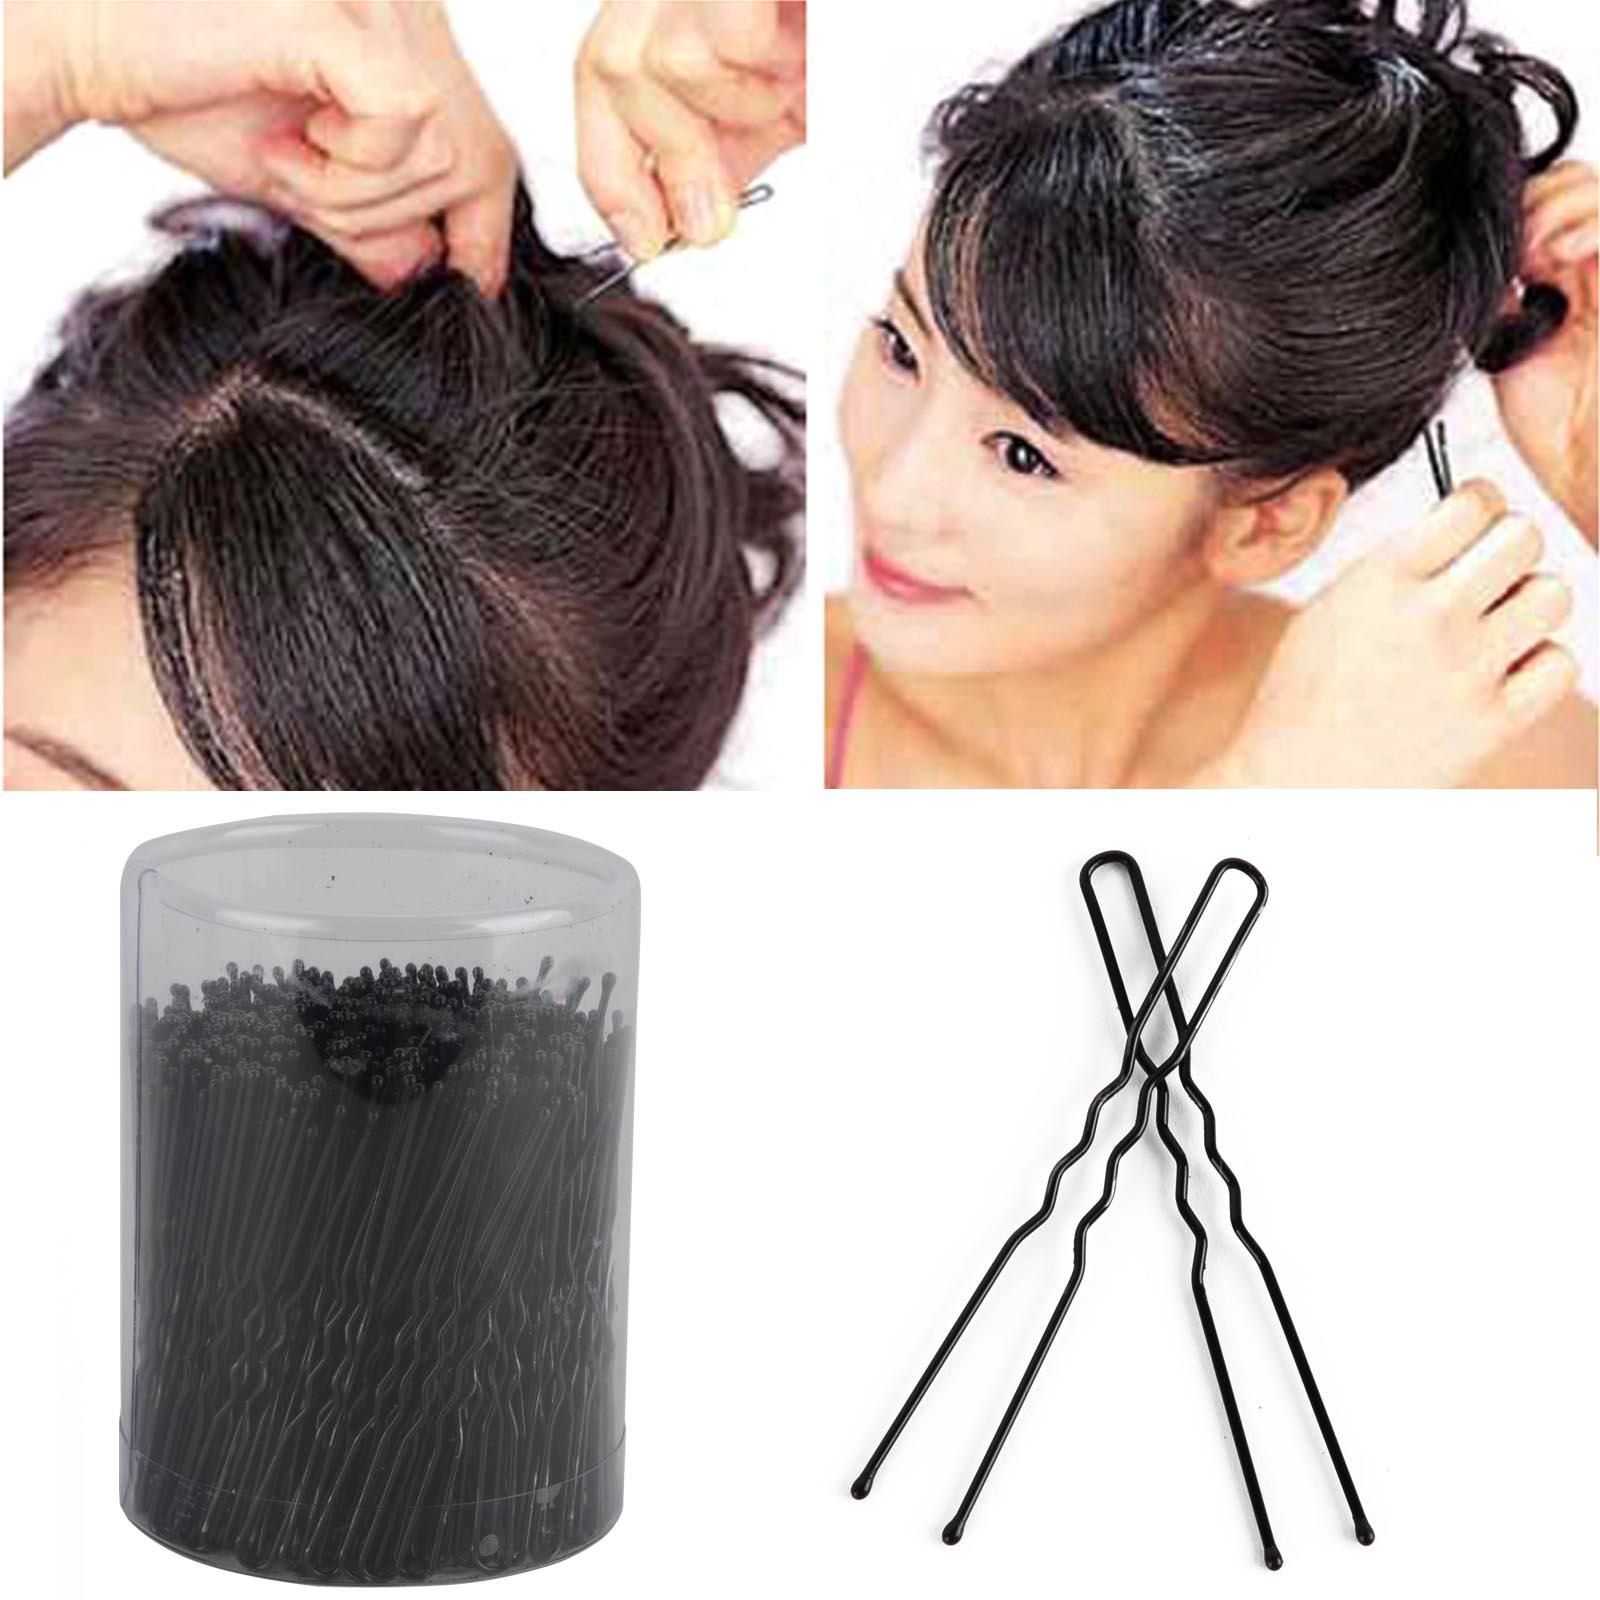 Mayitr 300pcs New Black U-shaped Hair Clips M Hair pins Hair Clip For Hair Styling Tool